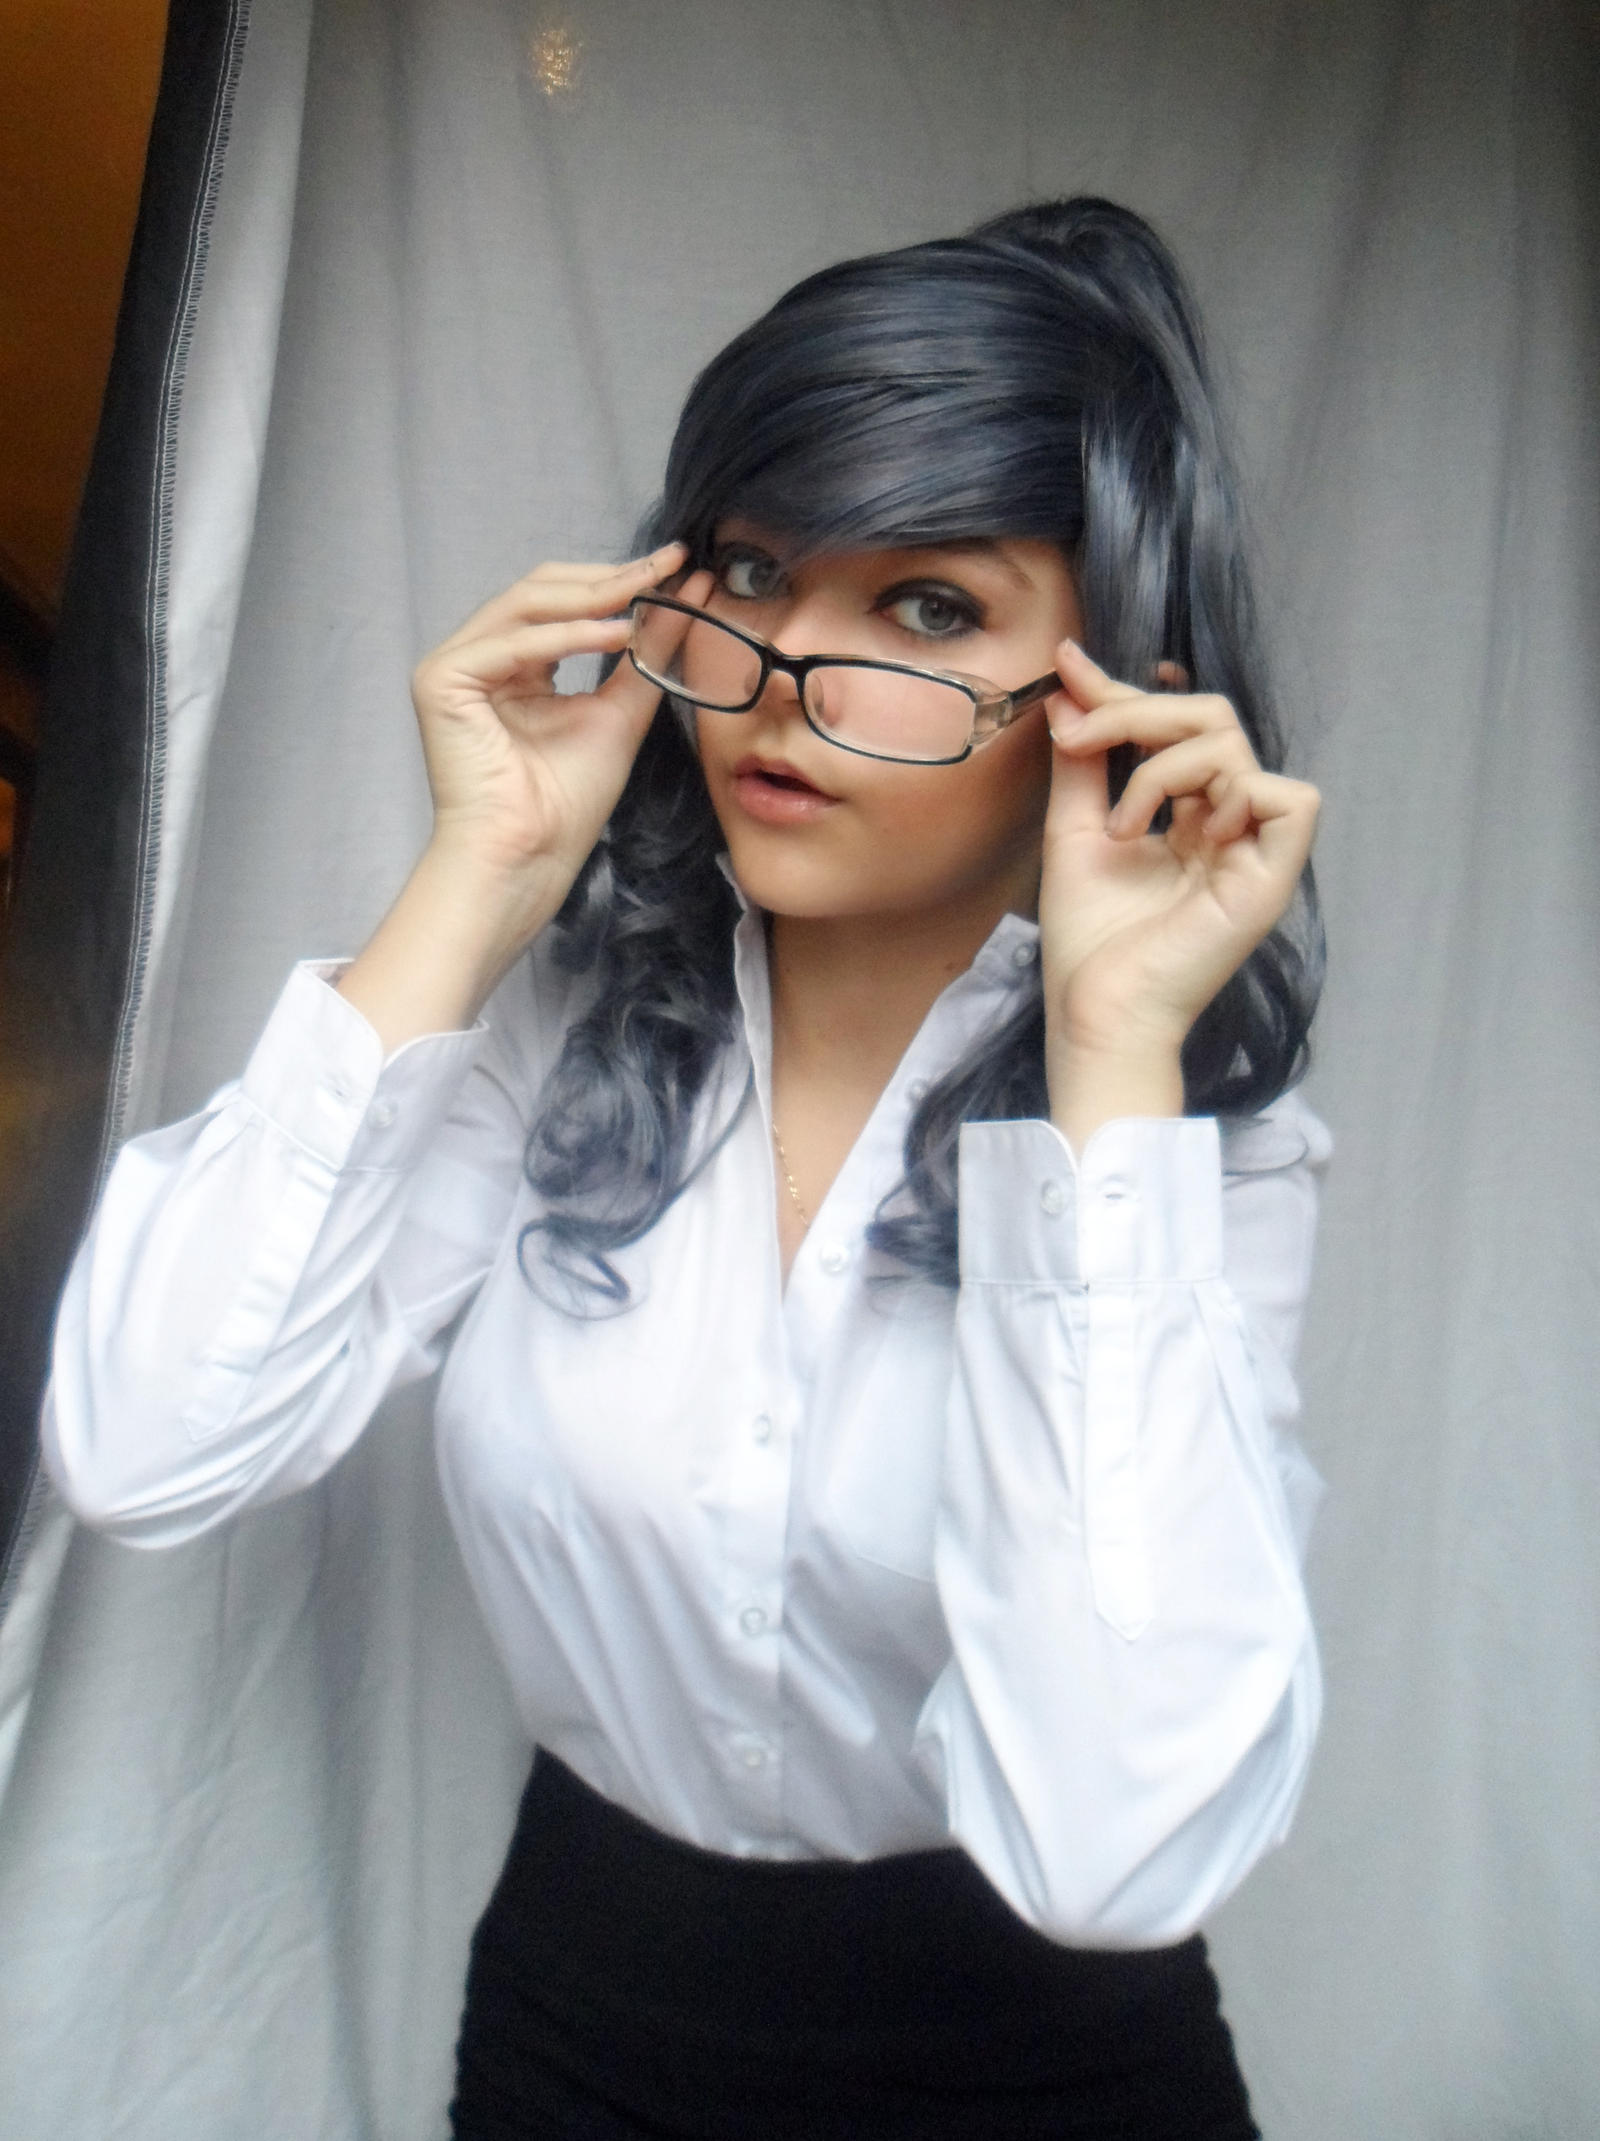 STOCK_50.1_Anime Teacher by Bellastanyer-STOCK